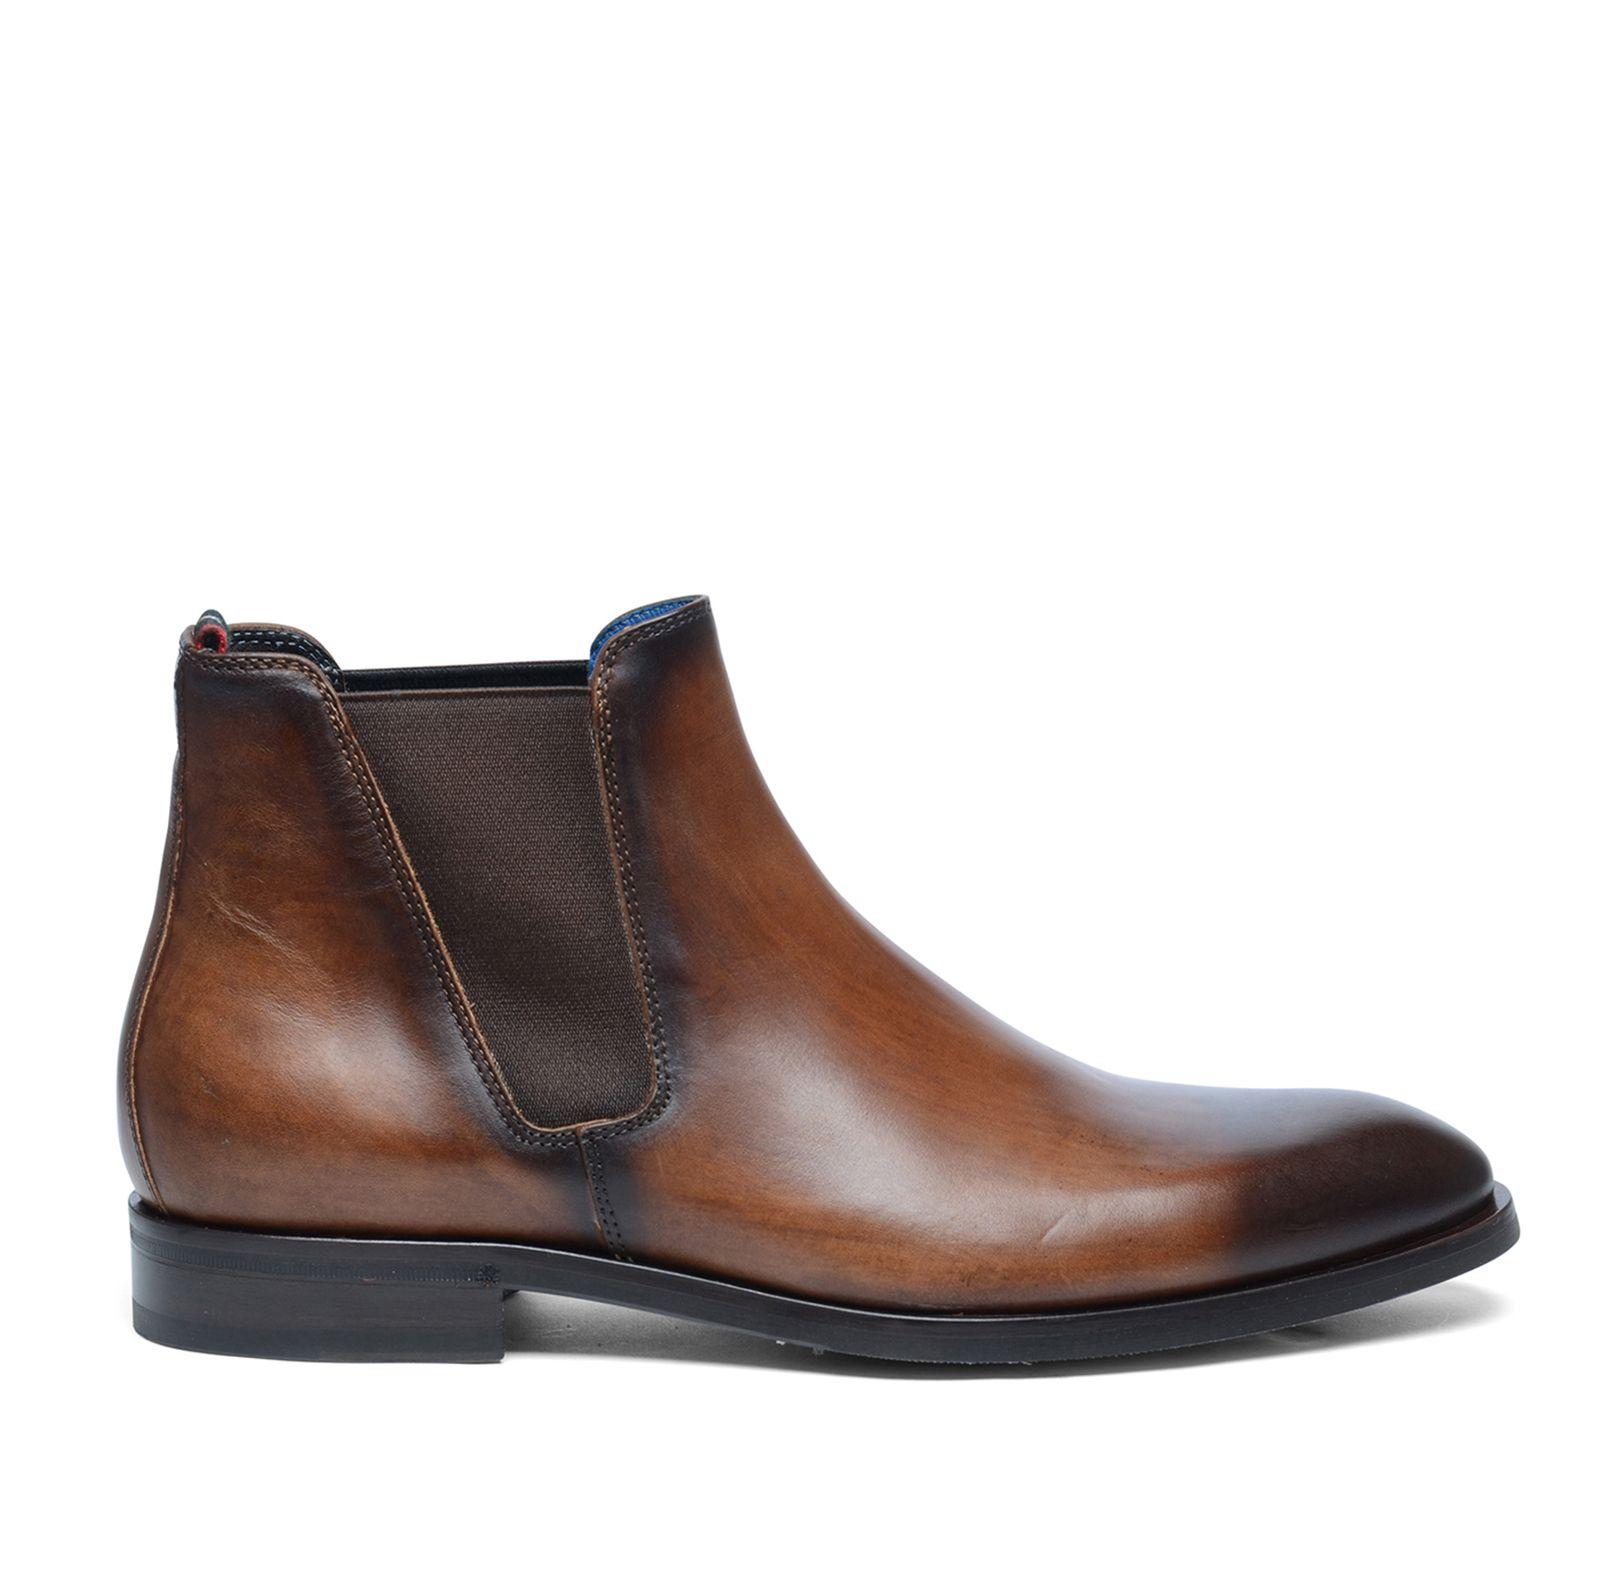 giorgio azzurro chelsea boots cognac chelsea boots. Black Bedroom Furniture Sets. Home Design Ideas